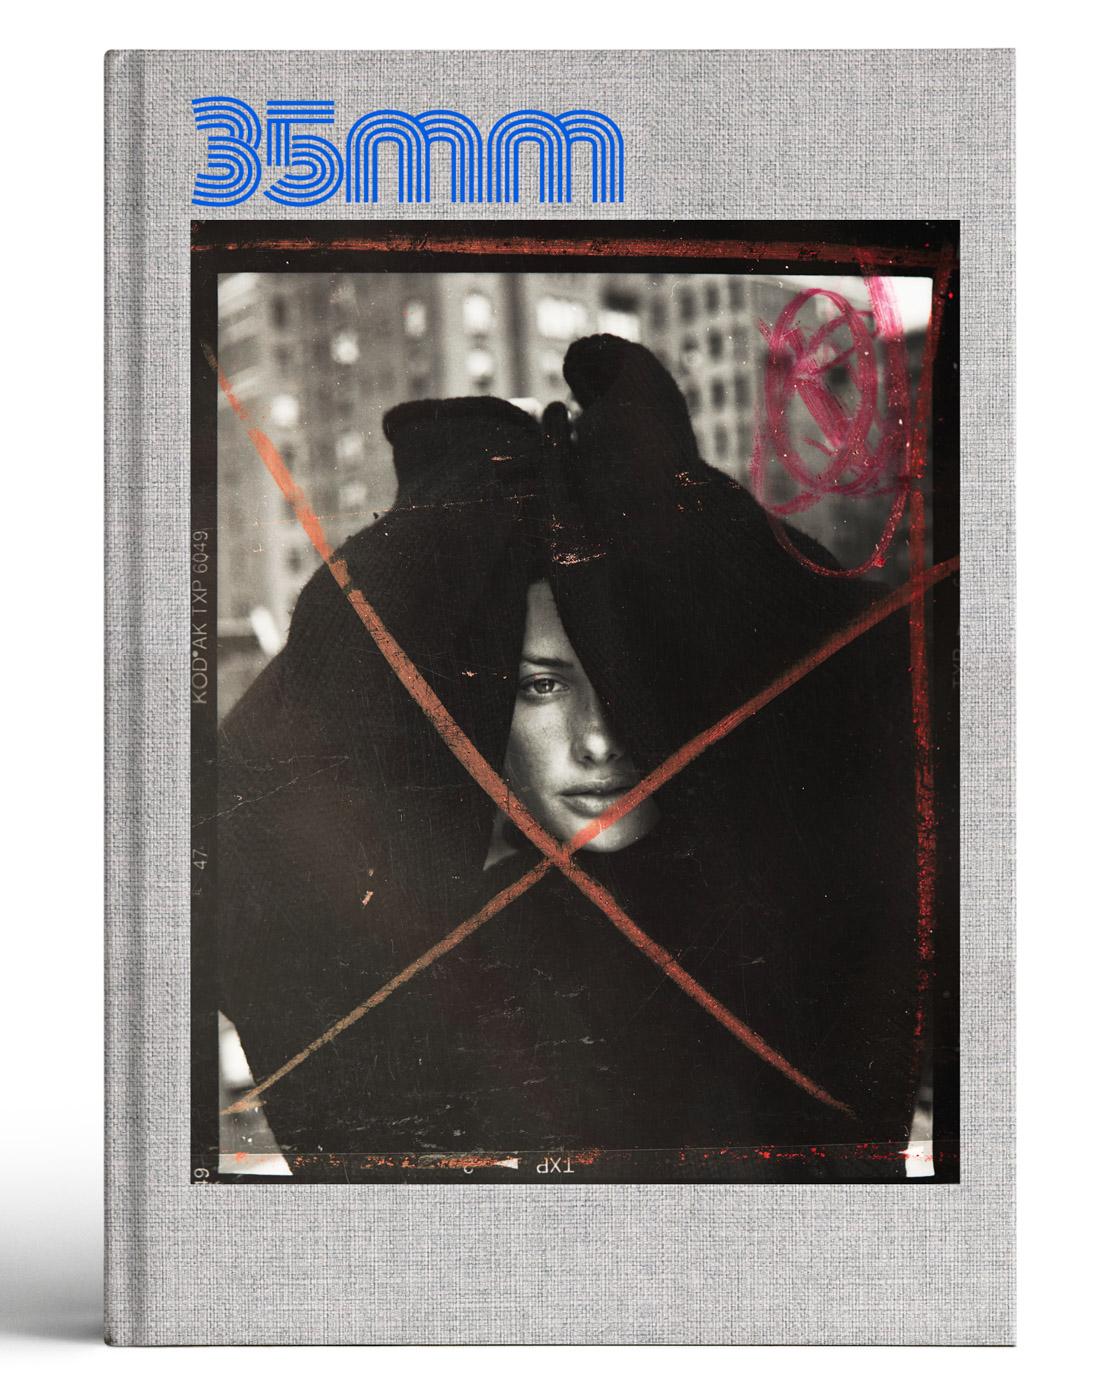 35mm_magazine_book_issue_film_only13.jpg